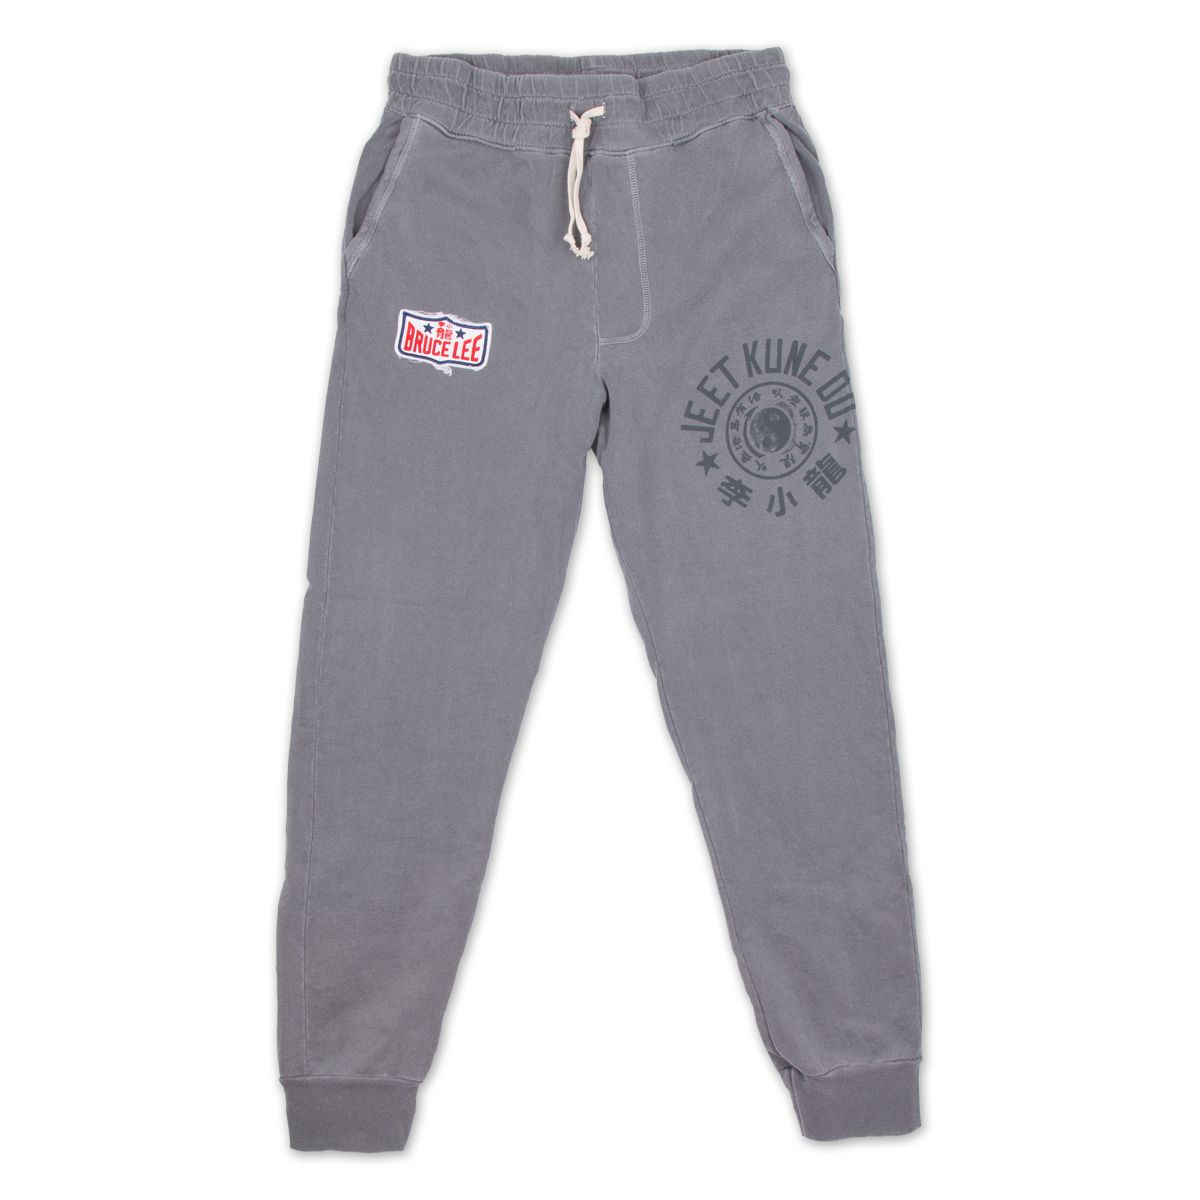 f9e18389 Bruce Lee JKD Sweatpants | Clothing | Bruce lee, Official store ...